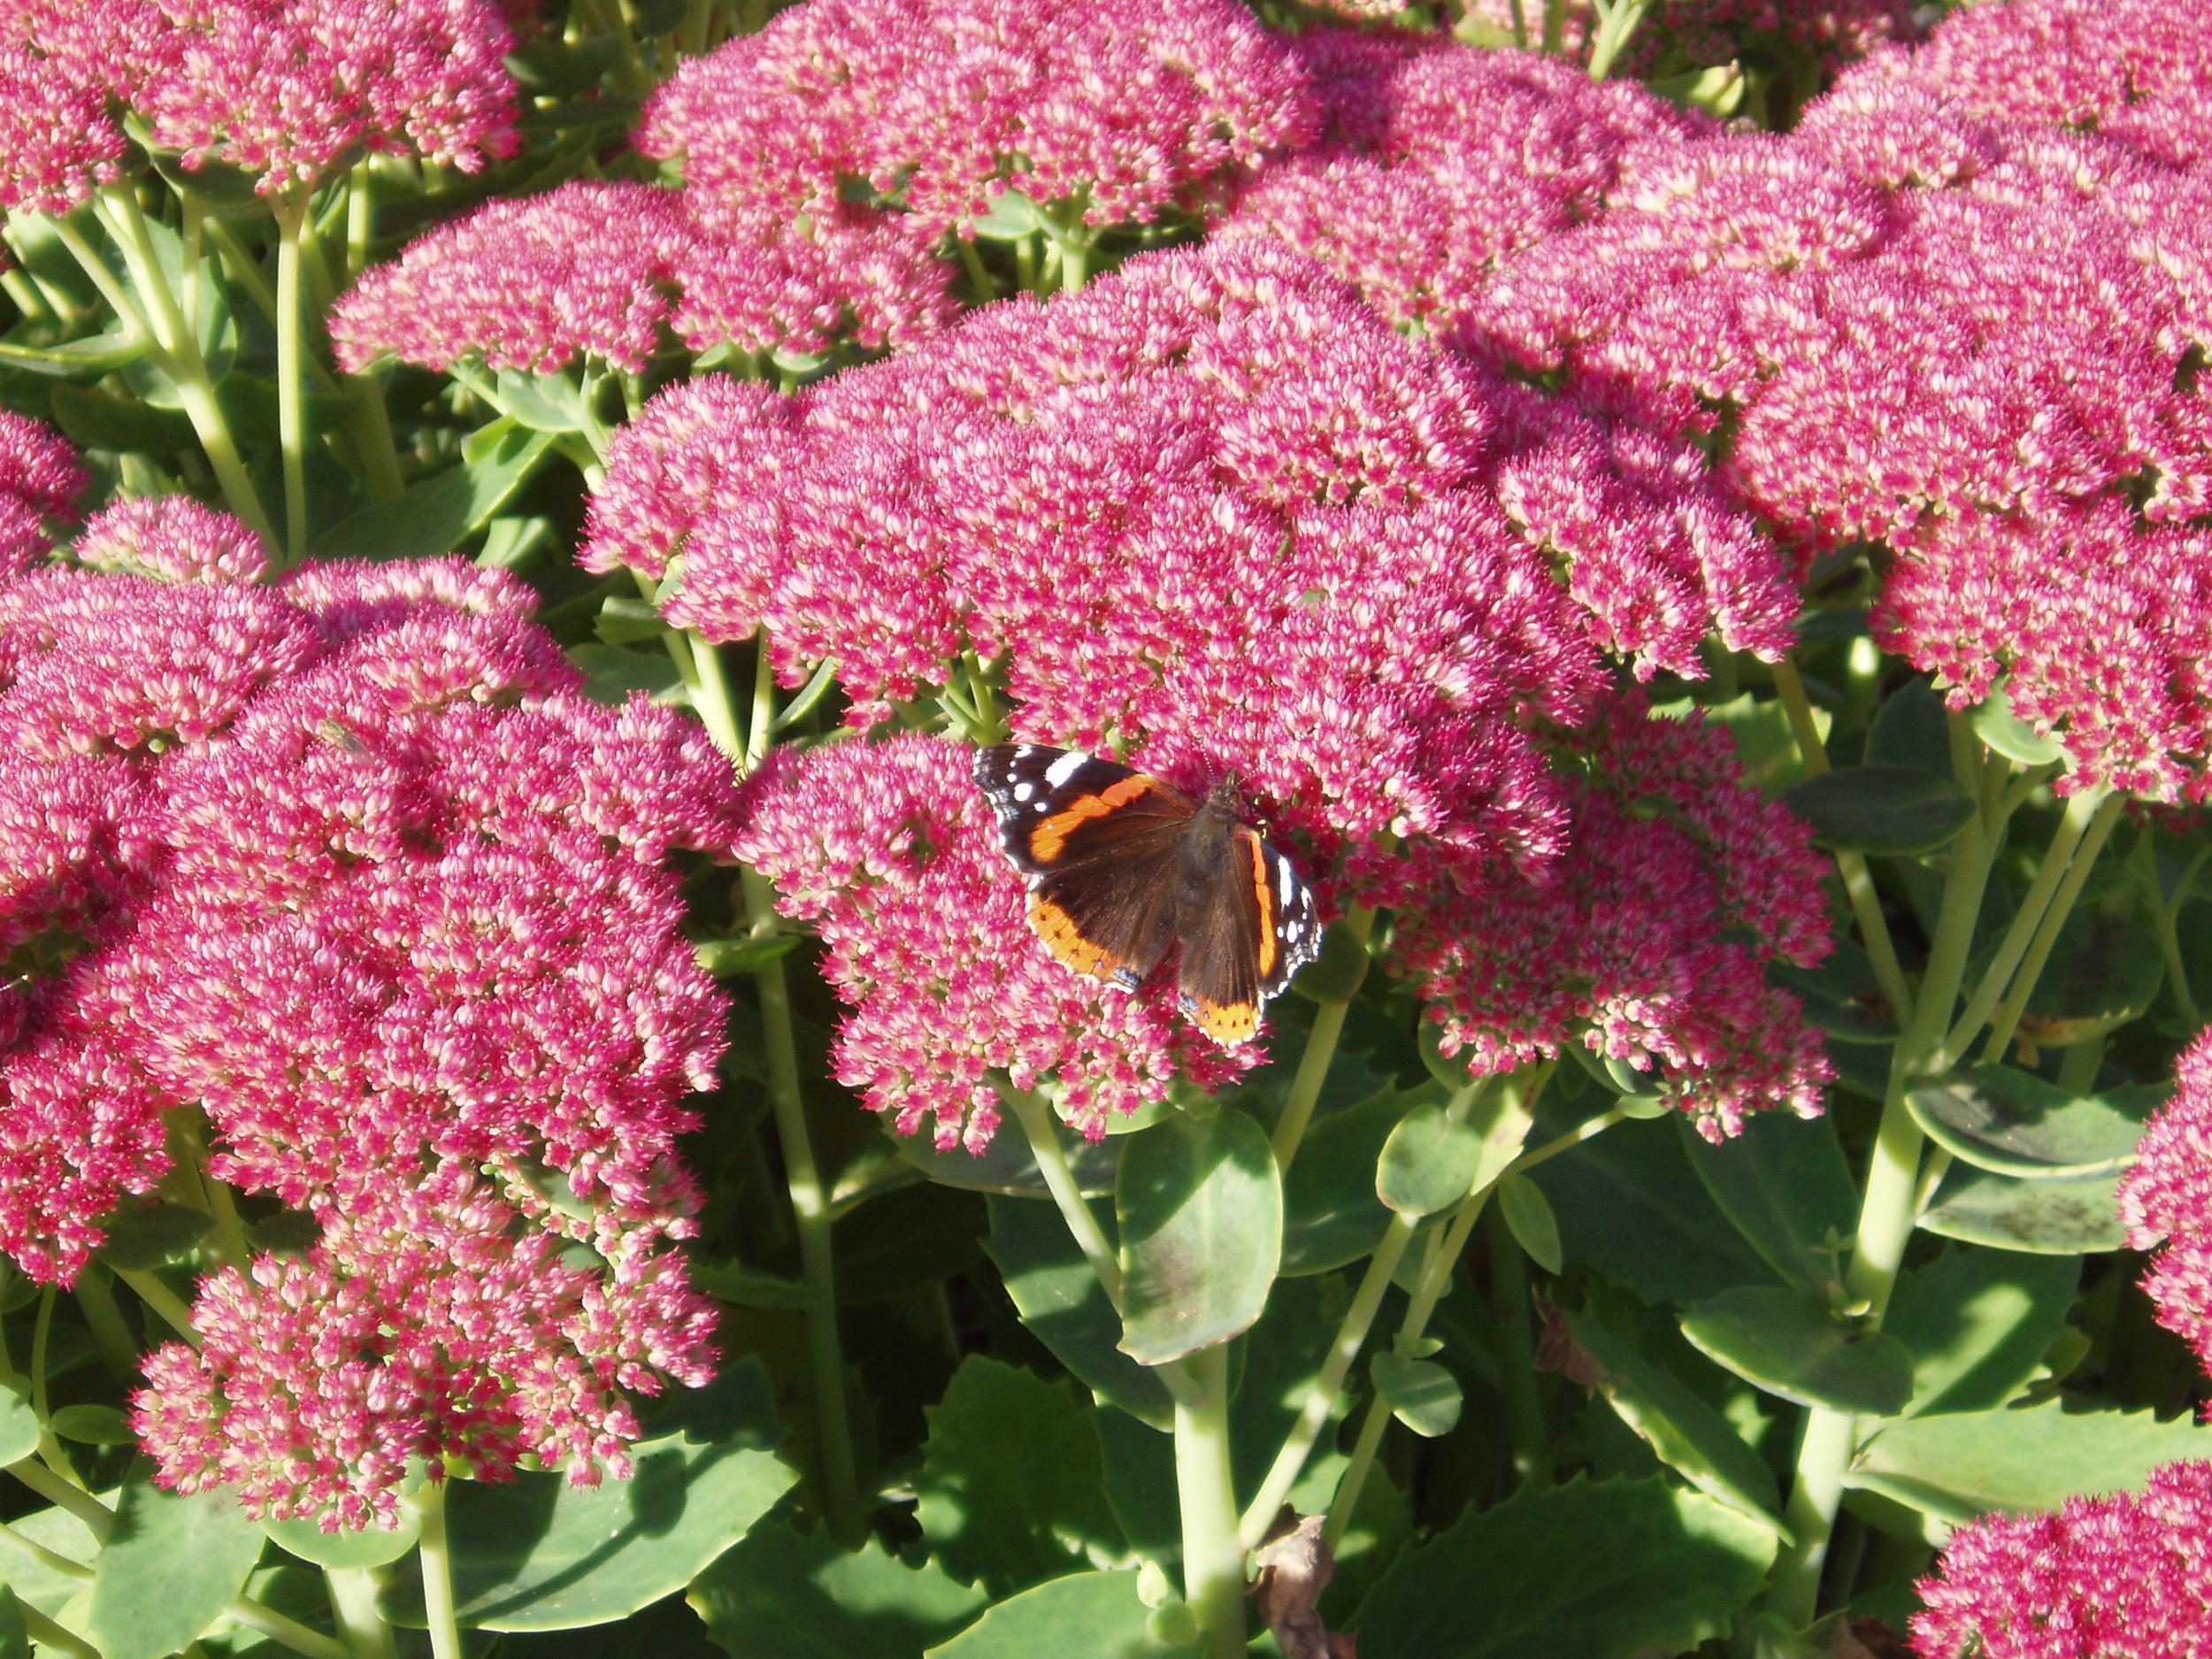 Natural - Red Admiral butterfly on sedum.jpg